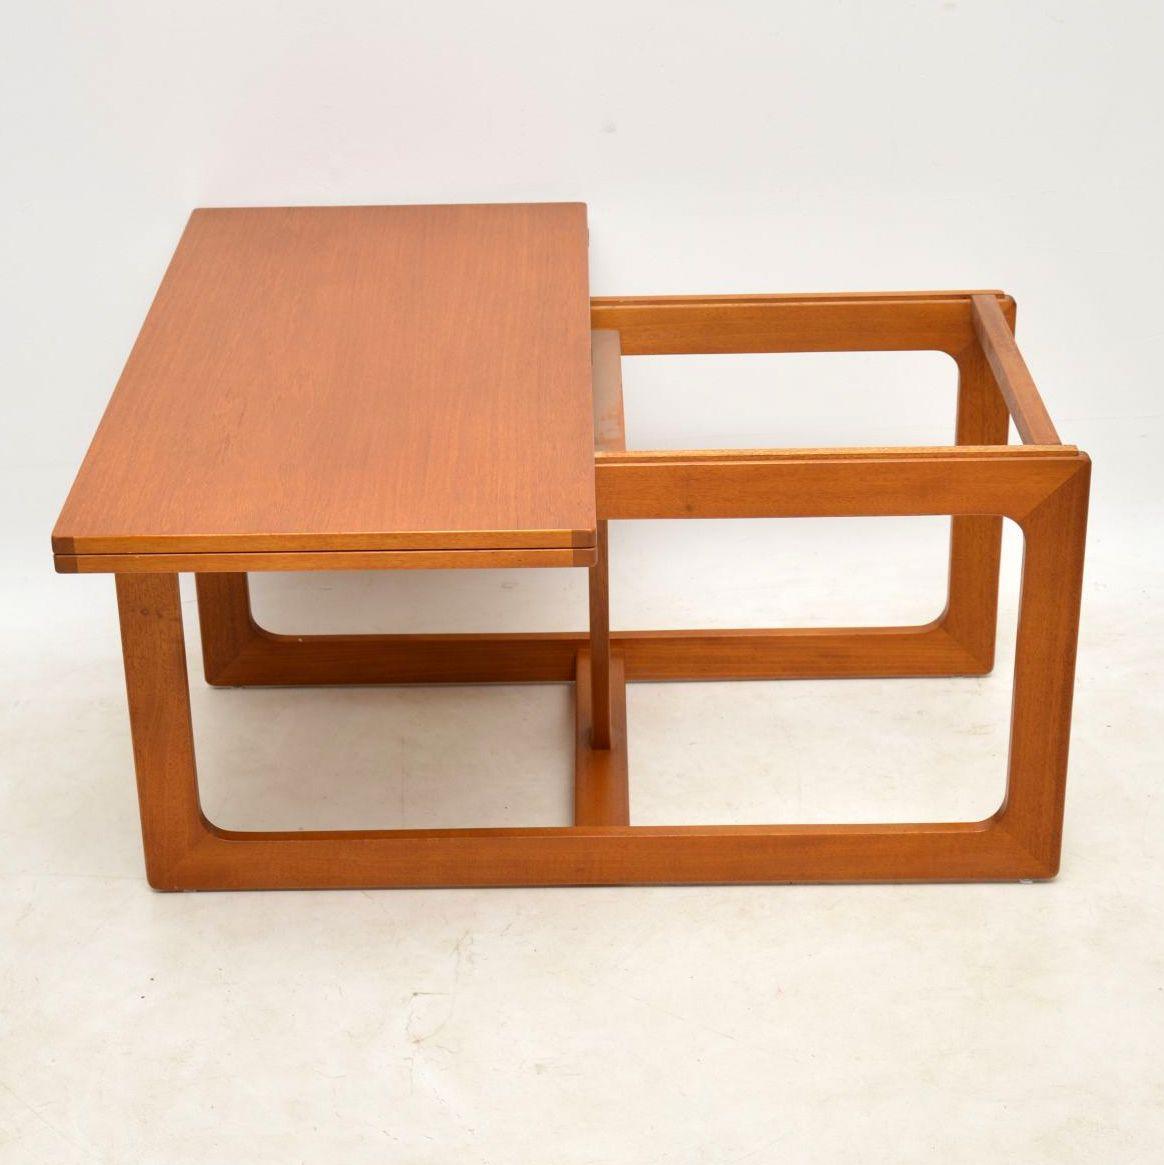 1960 S Vintage Teak Nesting Coffee Table Side Tables